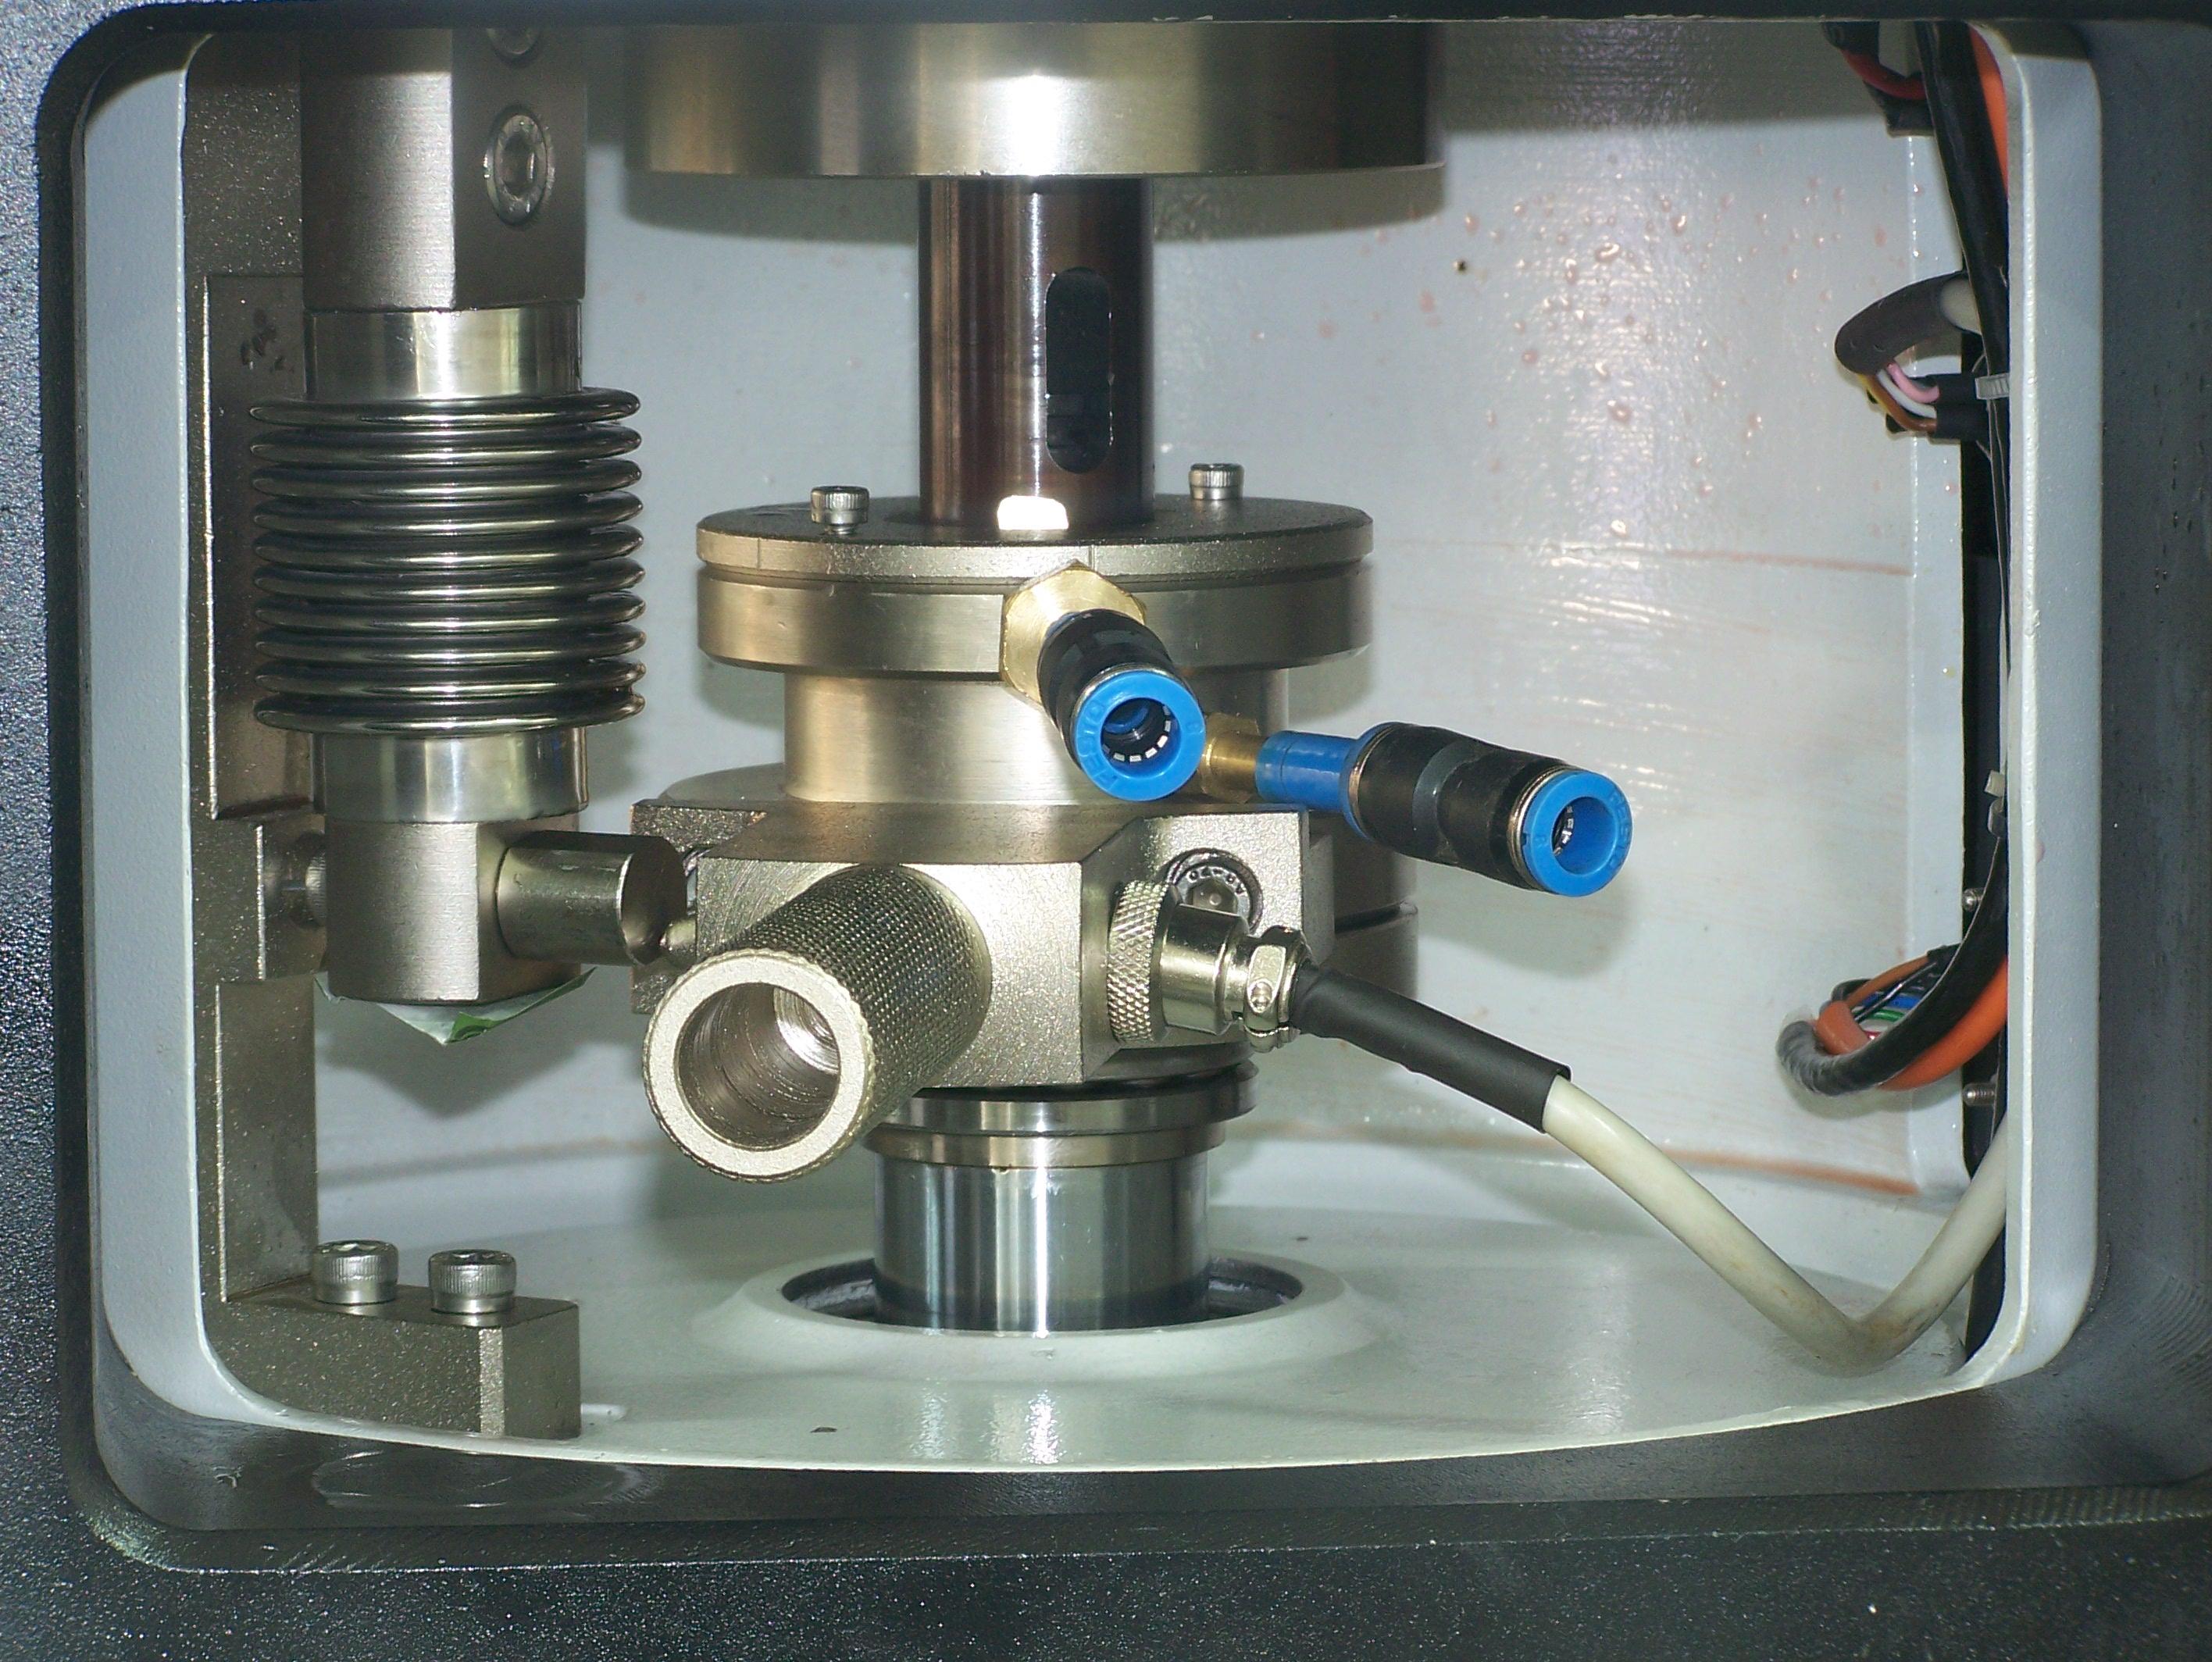 Four Ball Tester - KRL shear stability attachment